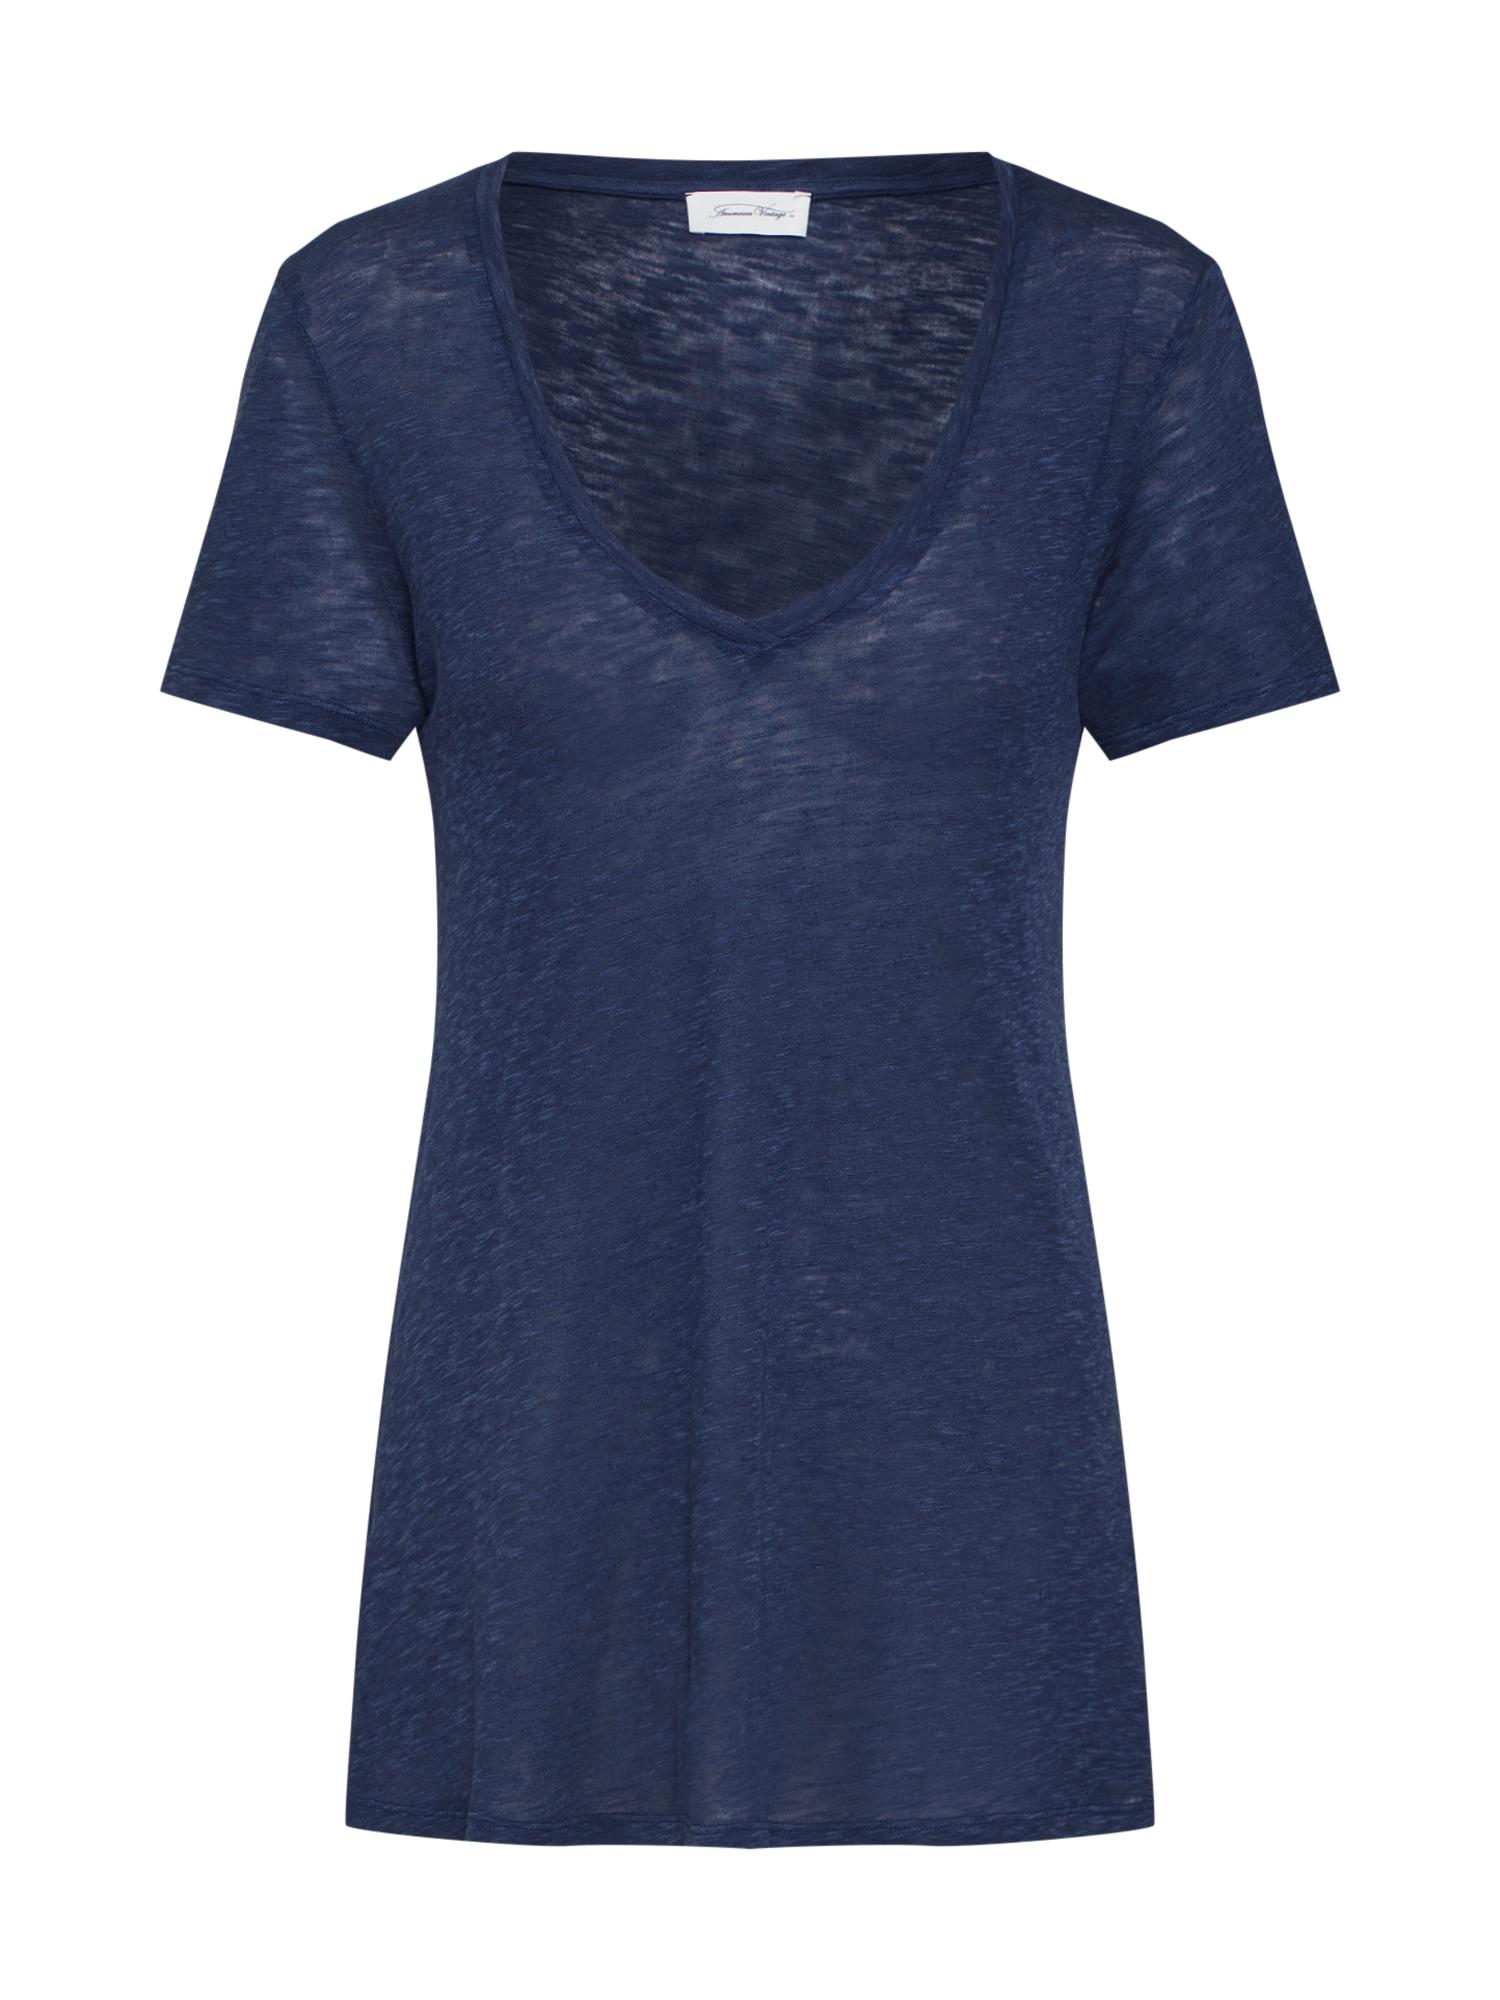 Tričko KOBI57H19 tmavě modrá AMERICAN VINTAGE